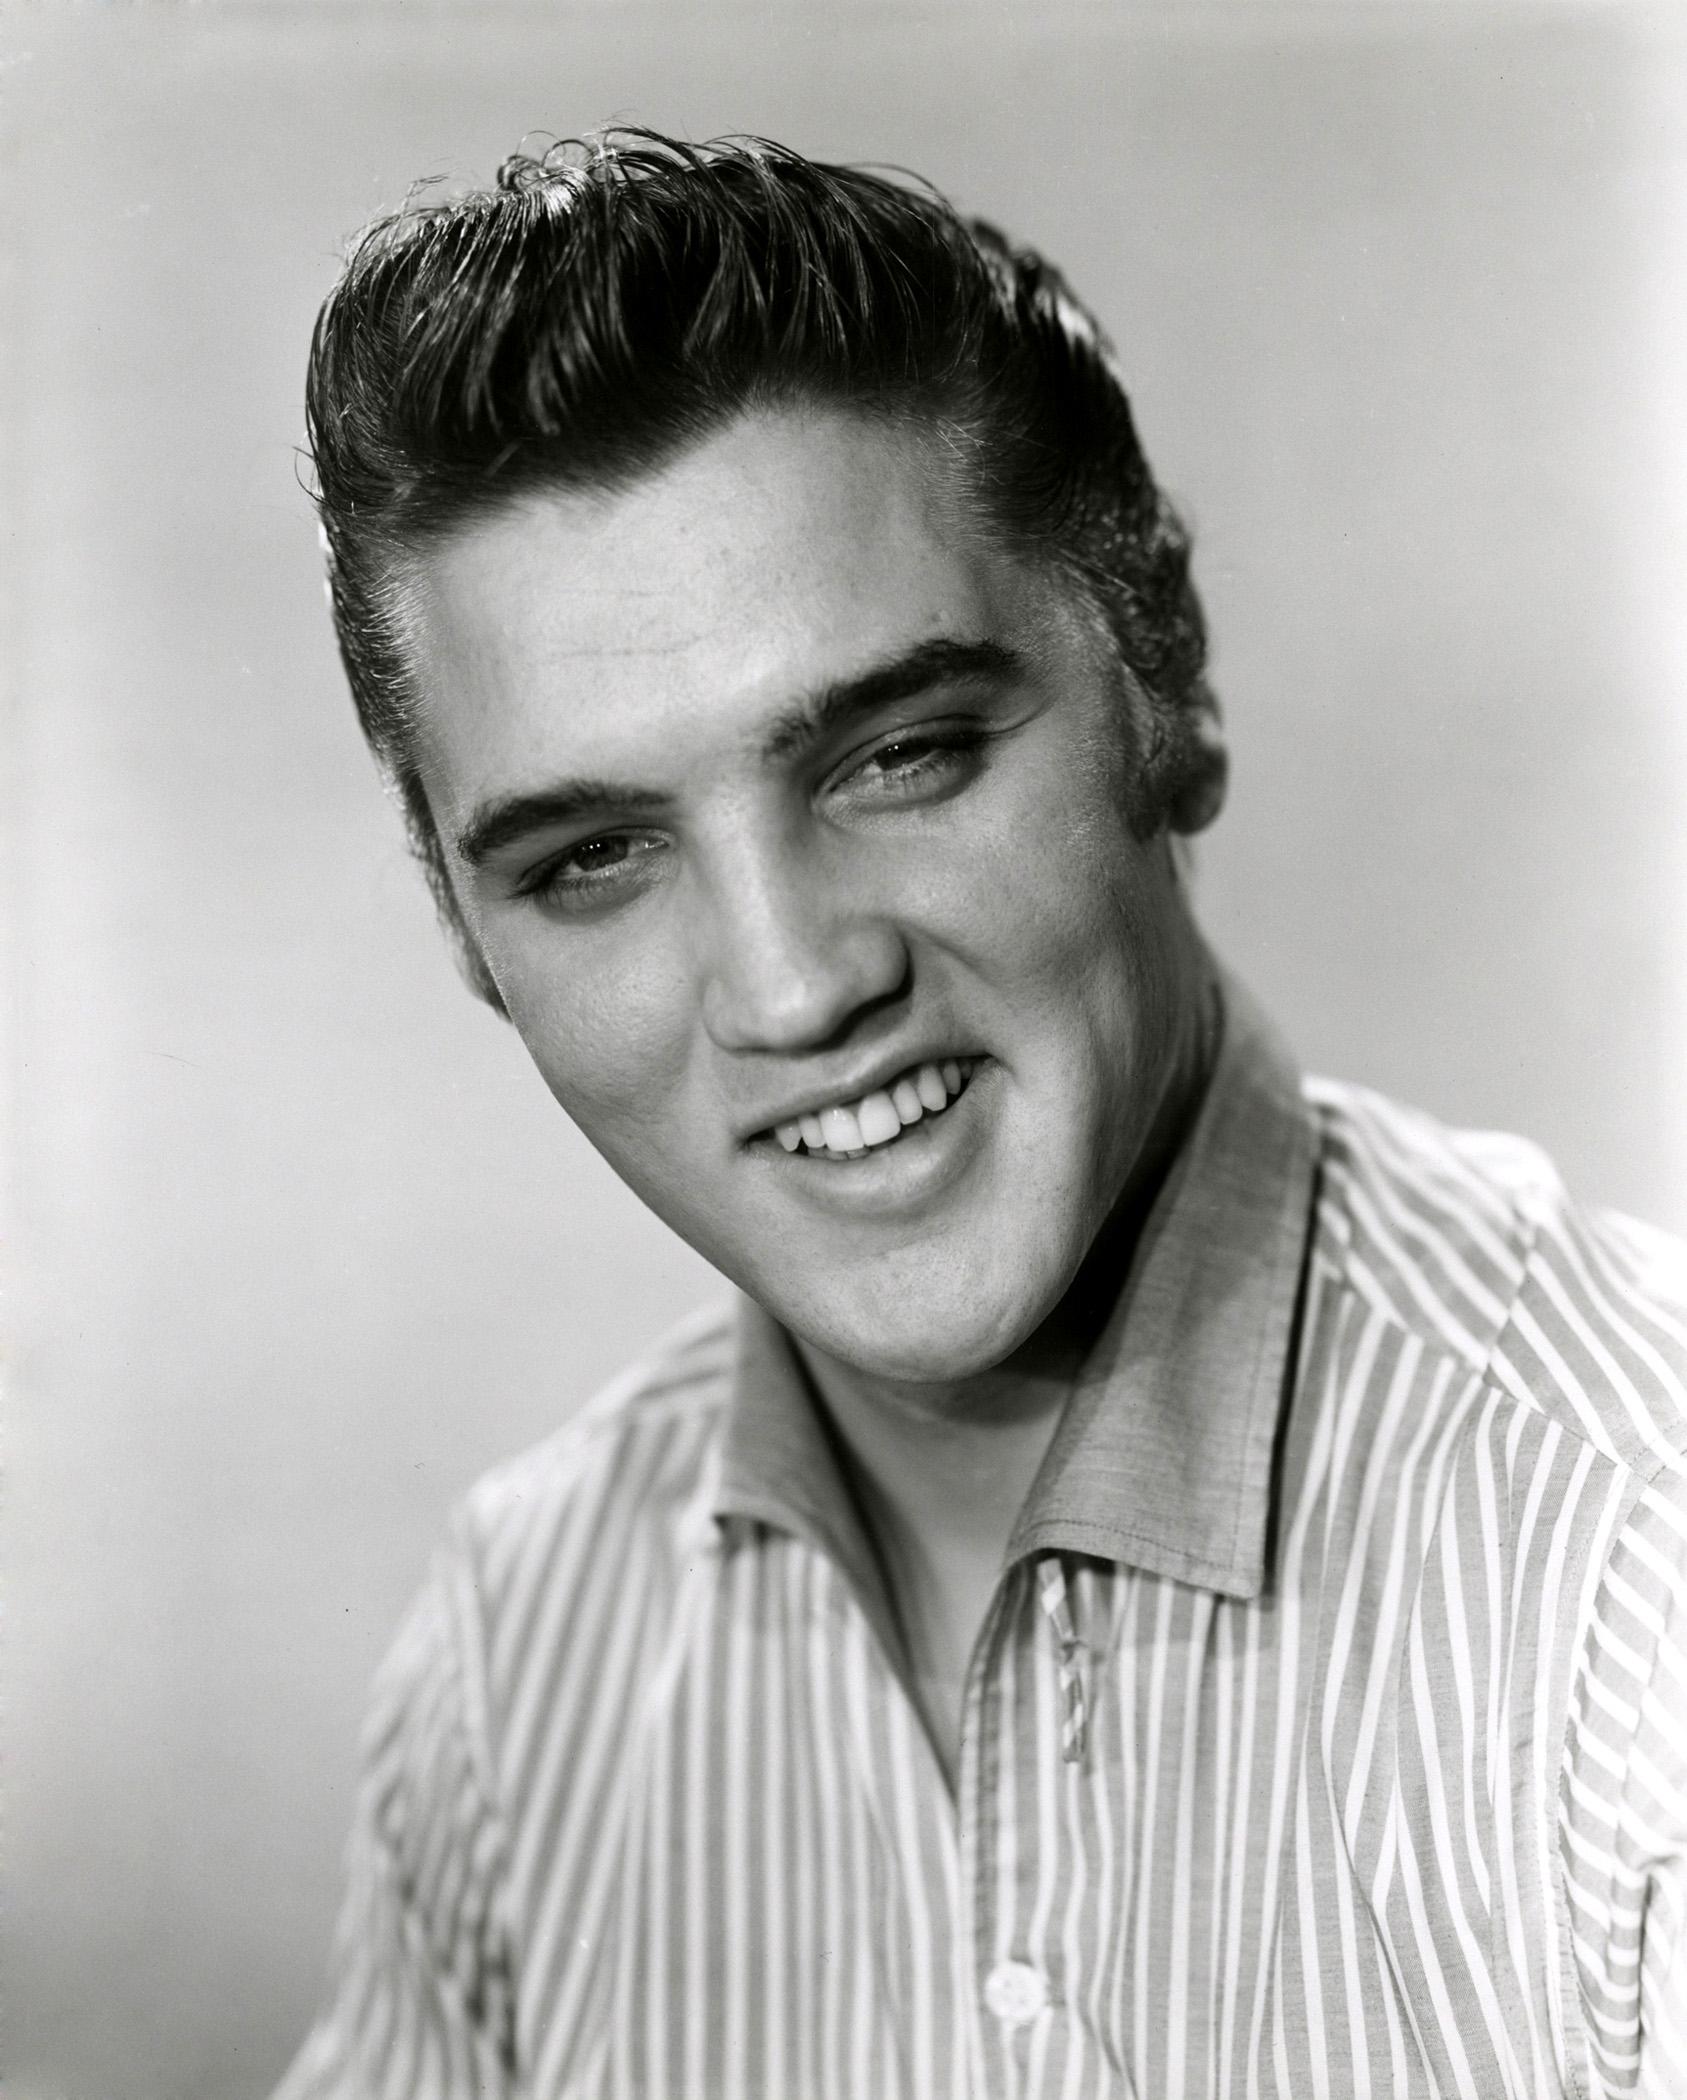 Elvis Presley - Wallpaper Gallery